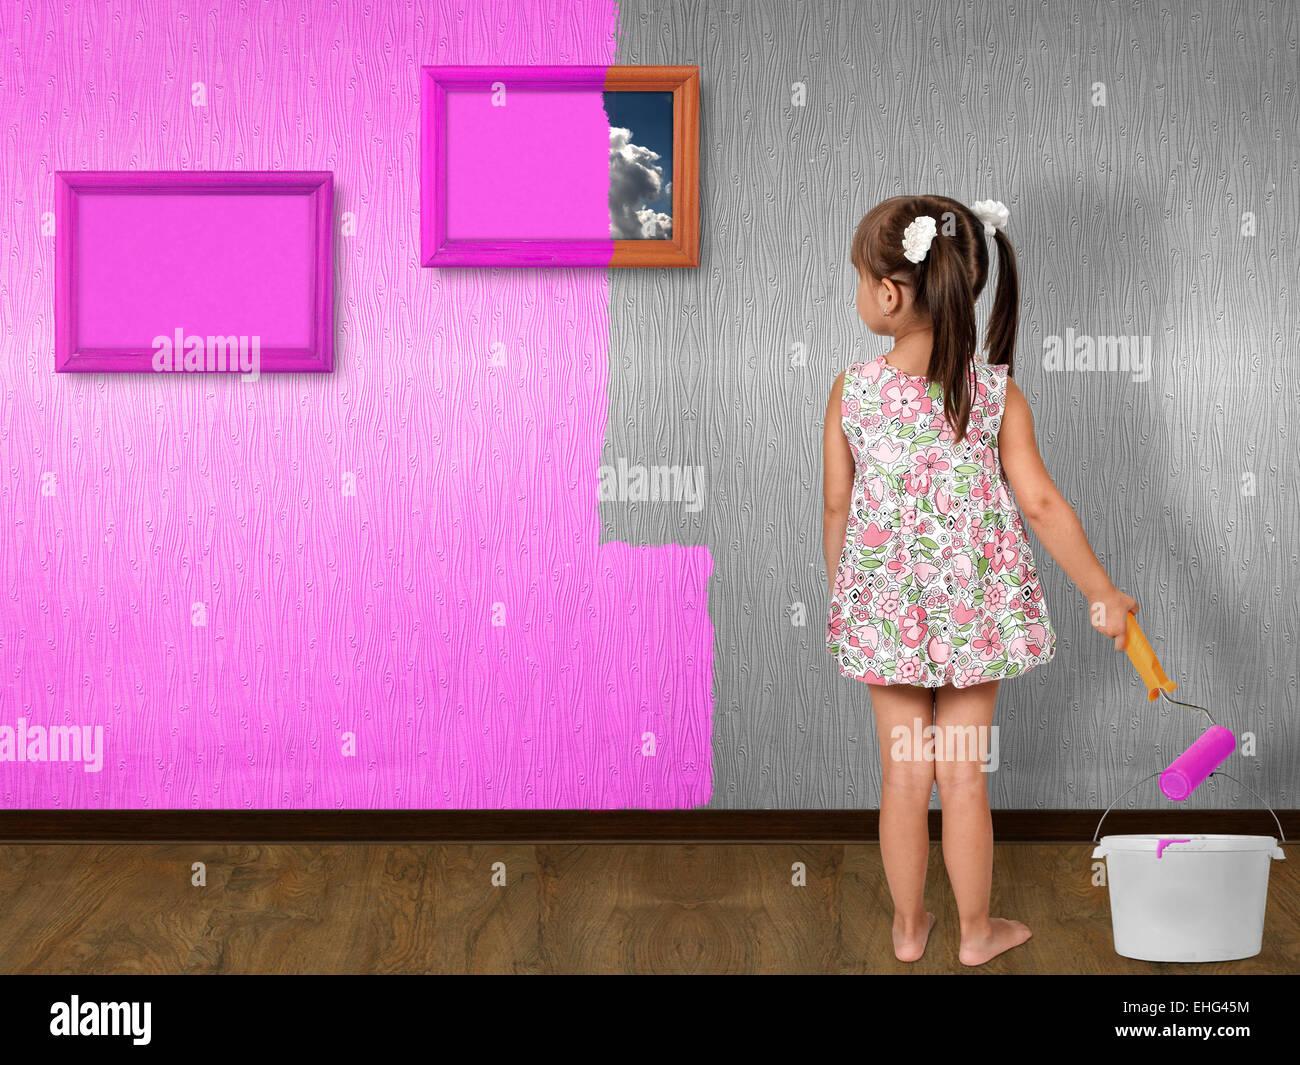 child girl doing repair, painting wall - Stock Image